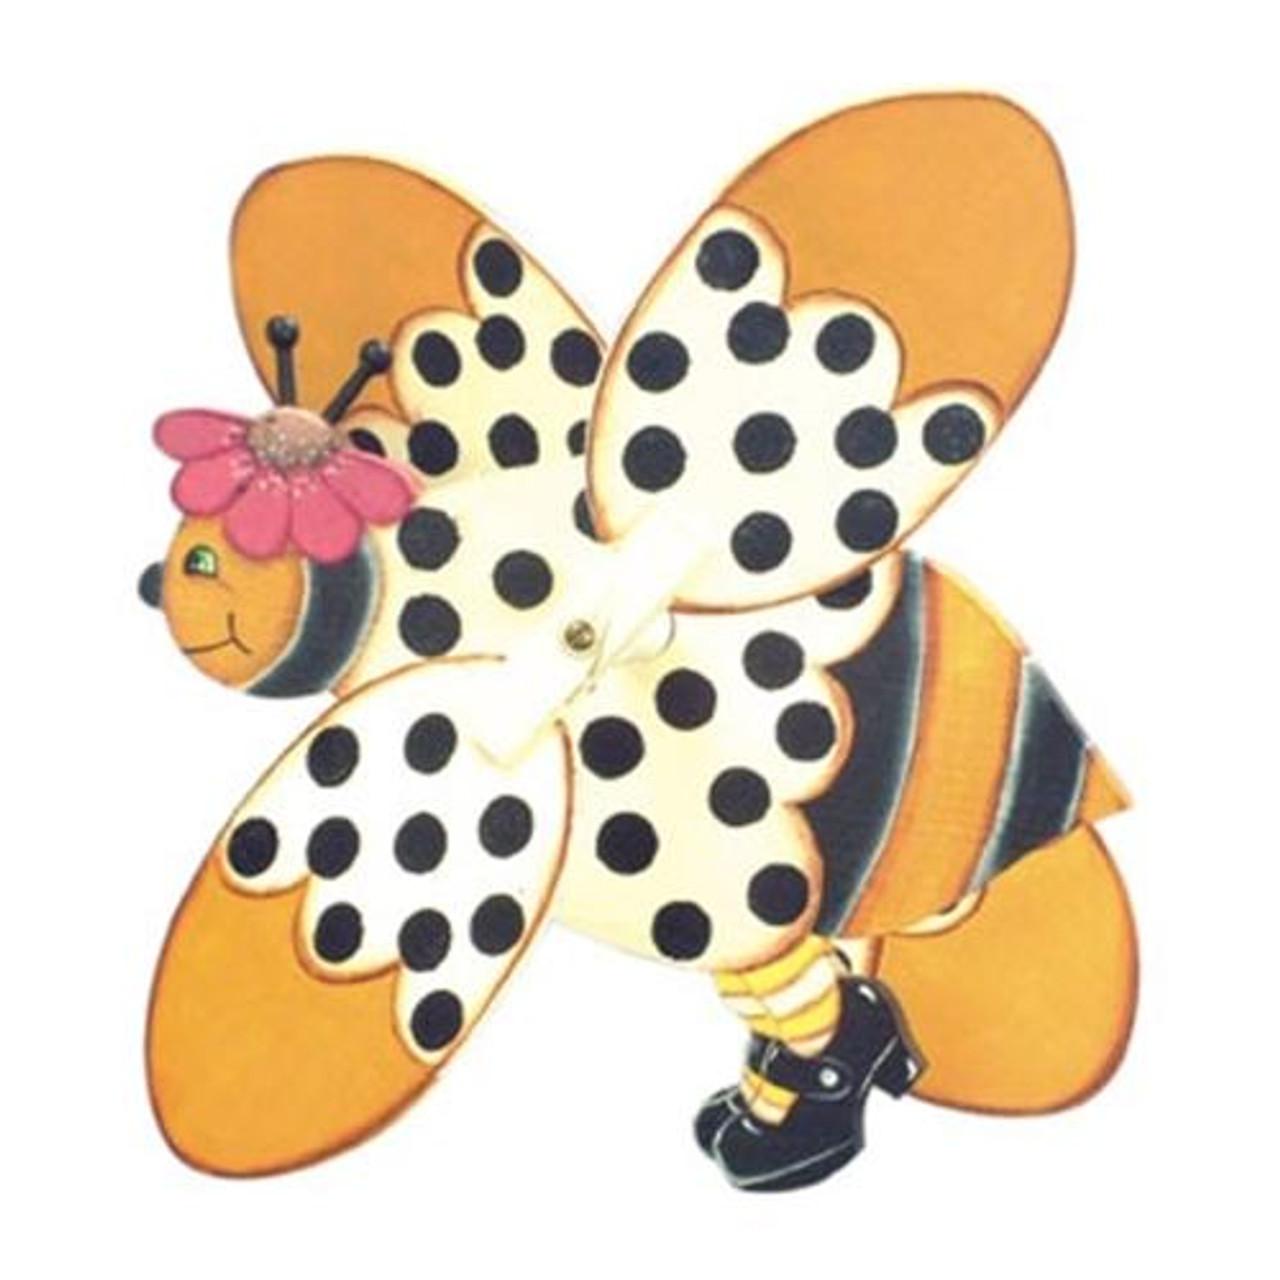 Cherry Tree Toys Bee Whirligig Plan